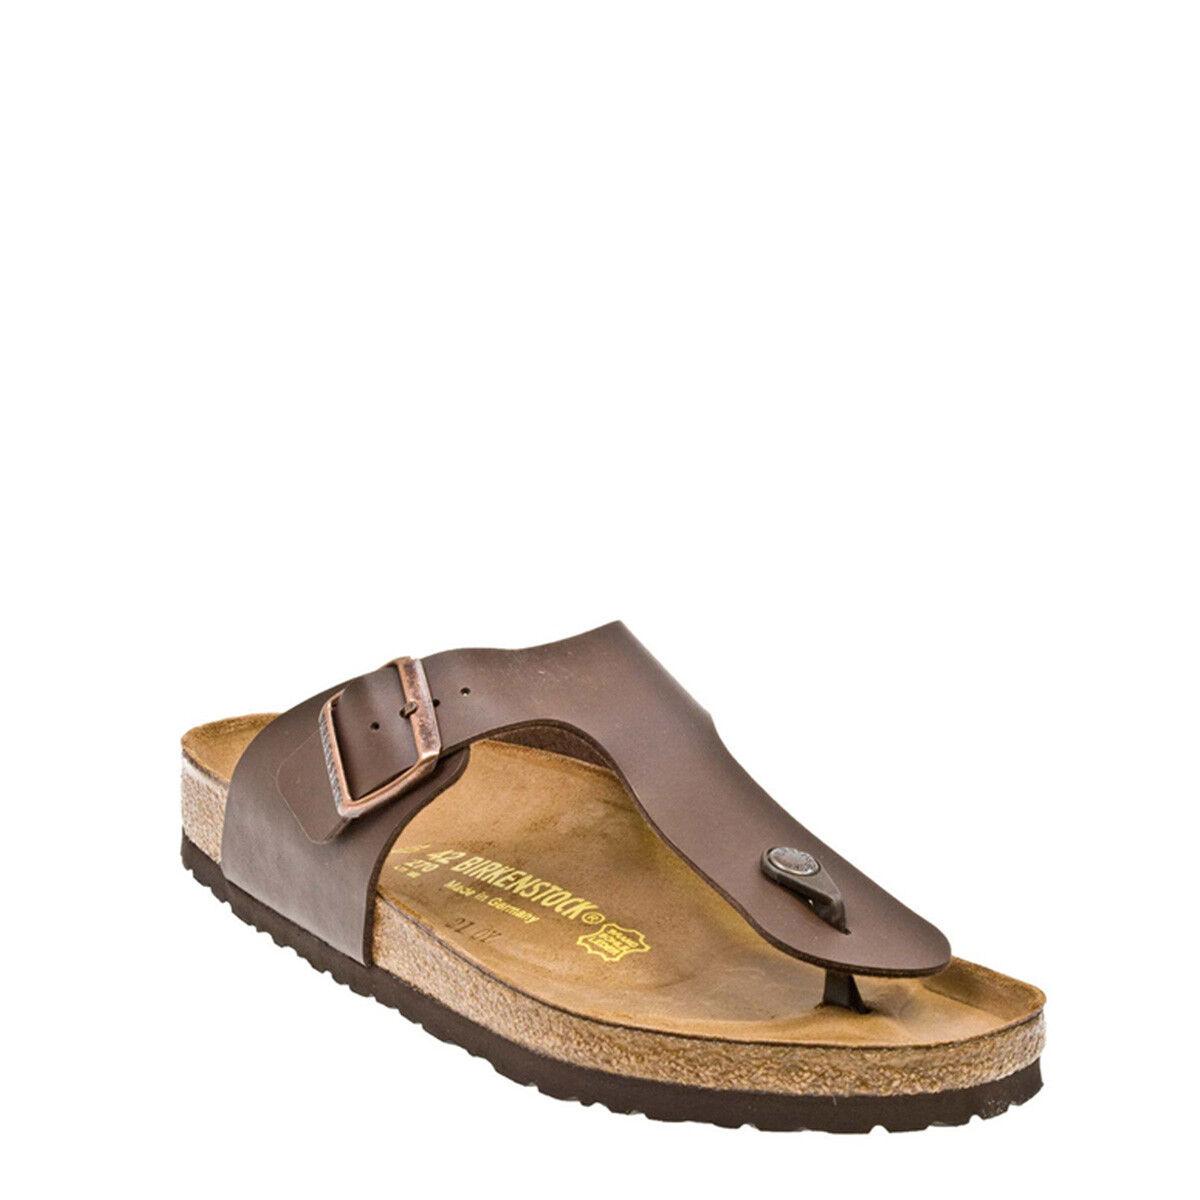 Birkenstock Sandals Ramses Birko-Flor Mens Brown Leather Sandals Birkenstock Toe Post Summer Shoes 1a3ffe